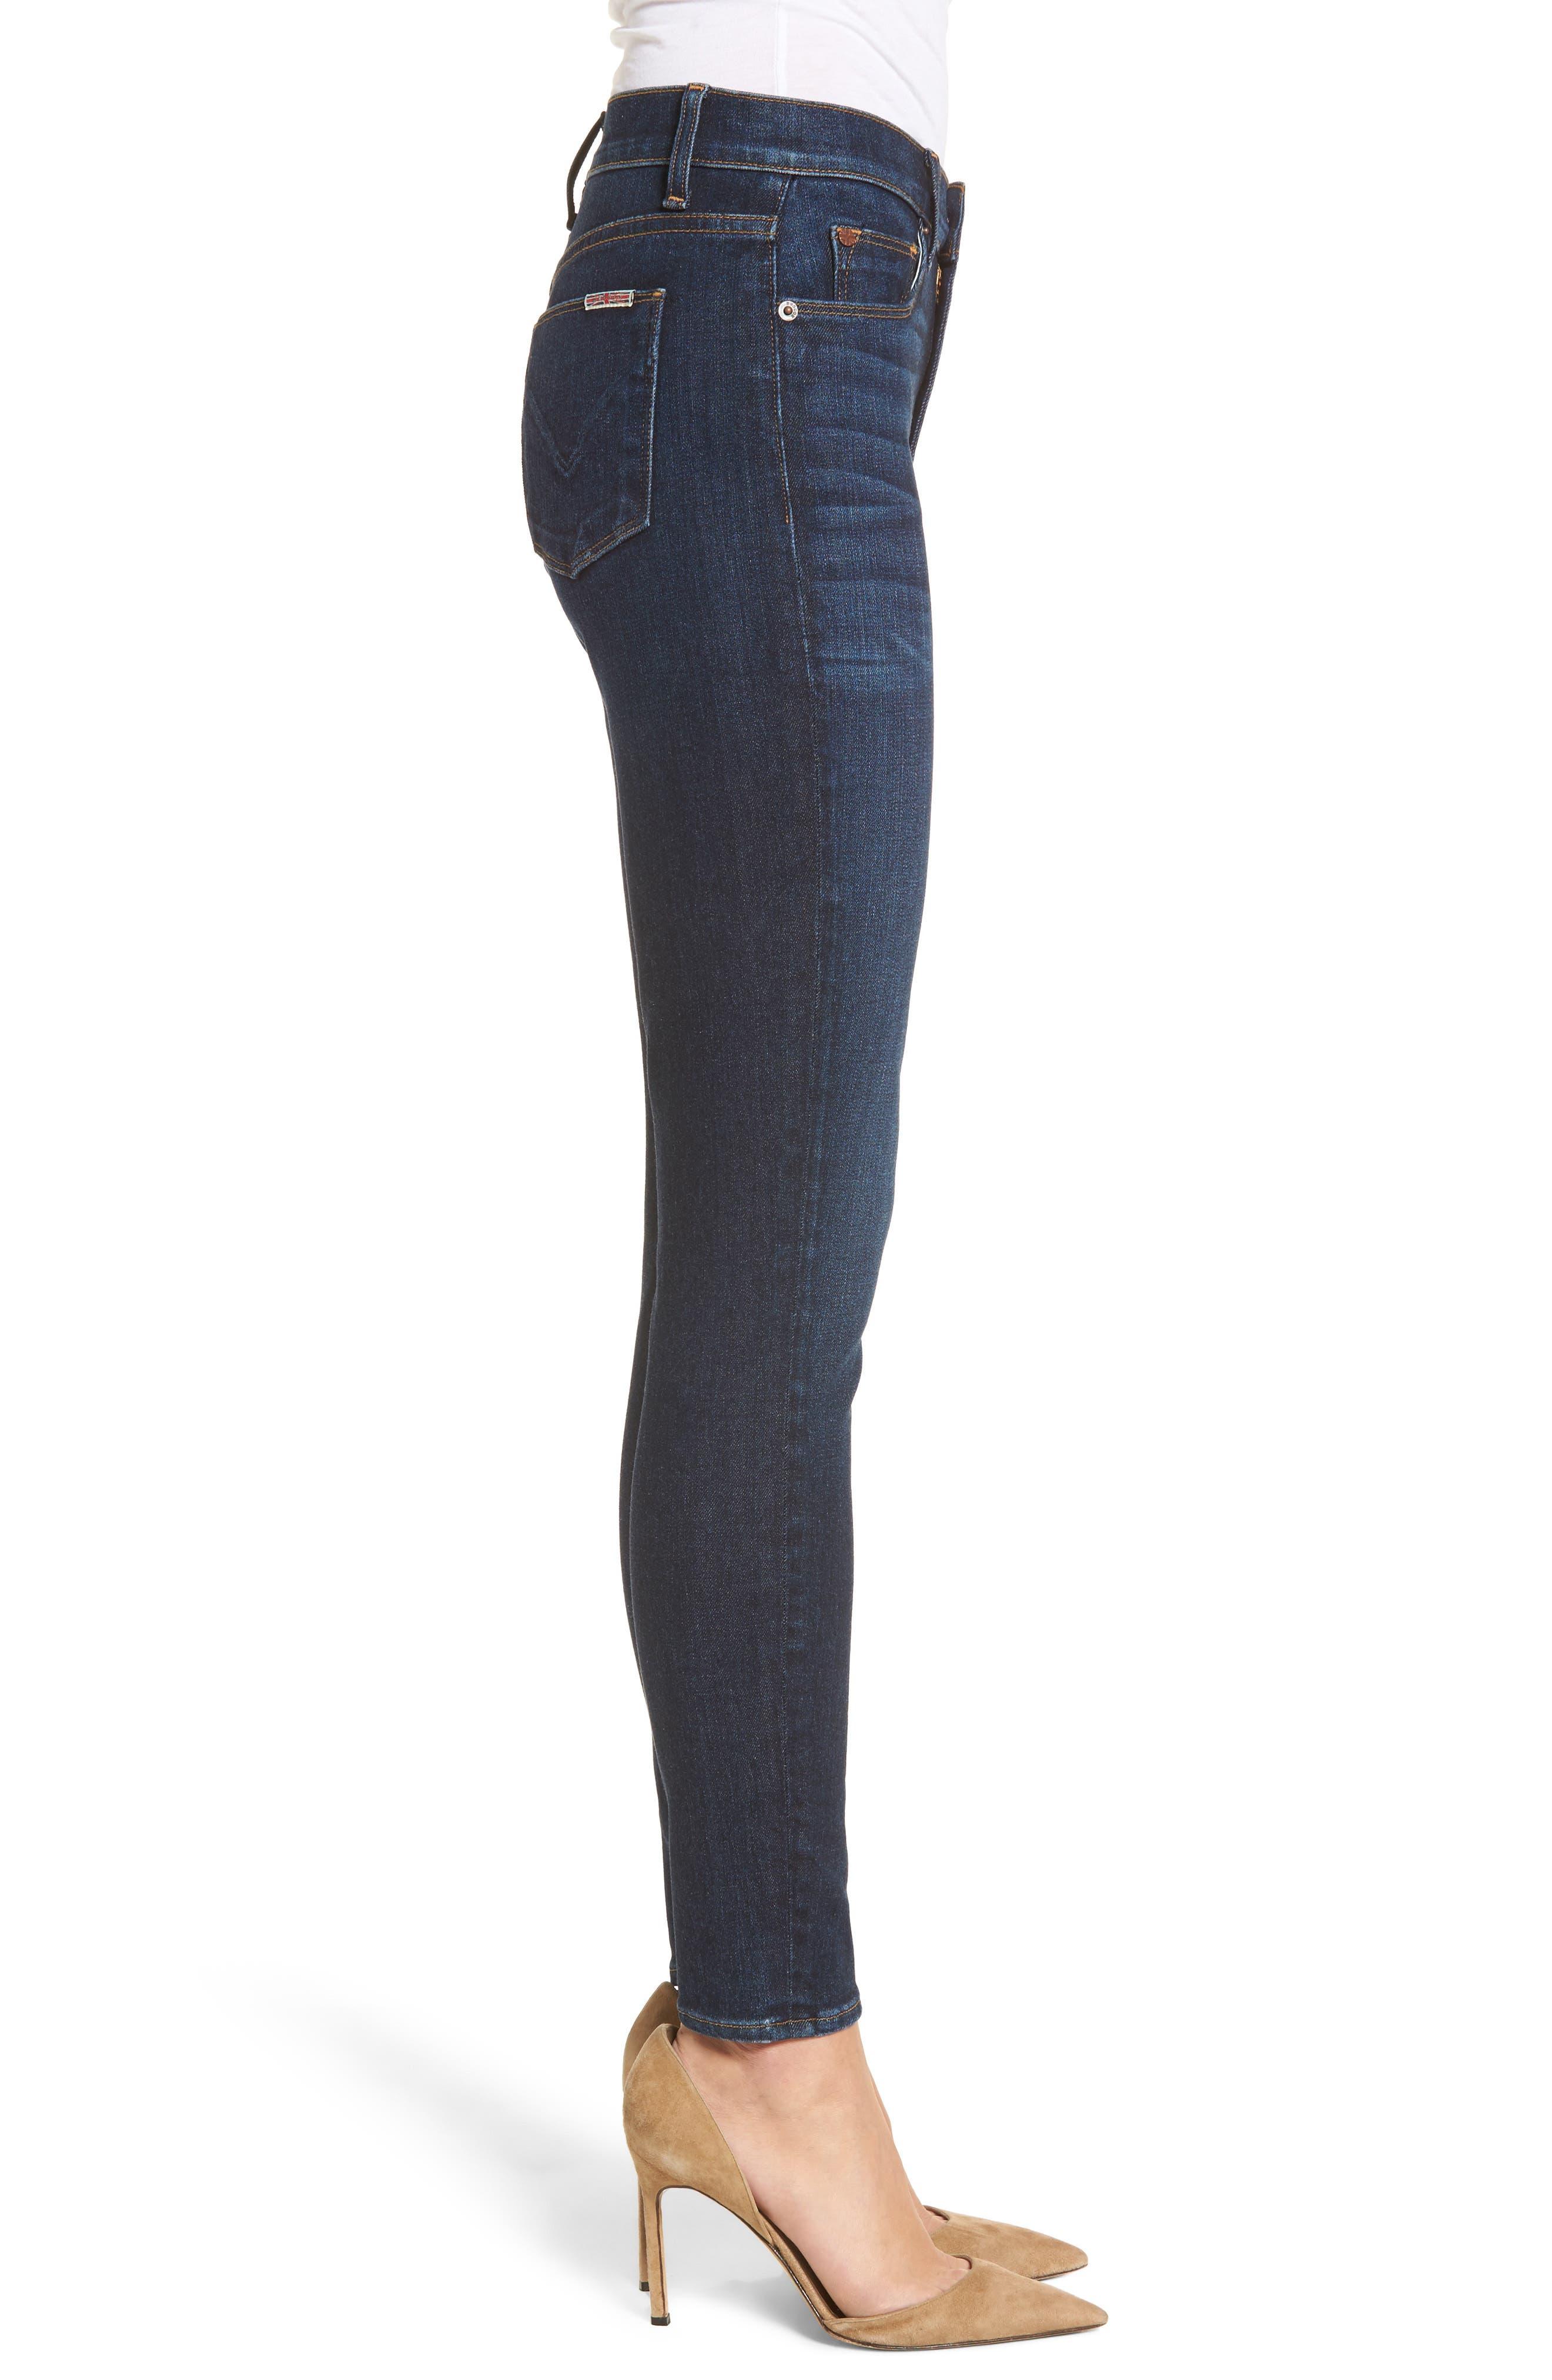 Barbara High Waist Ankle Super Skinny Jeans,                             Alternate thumbnail 3, color,                             Daze